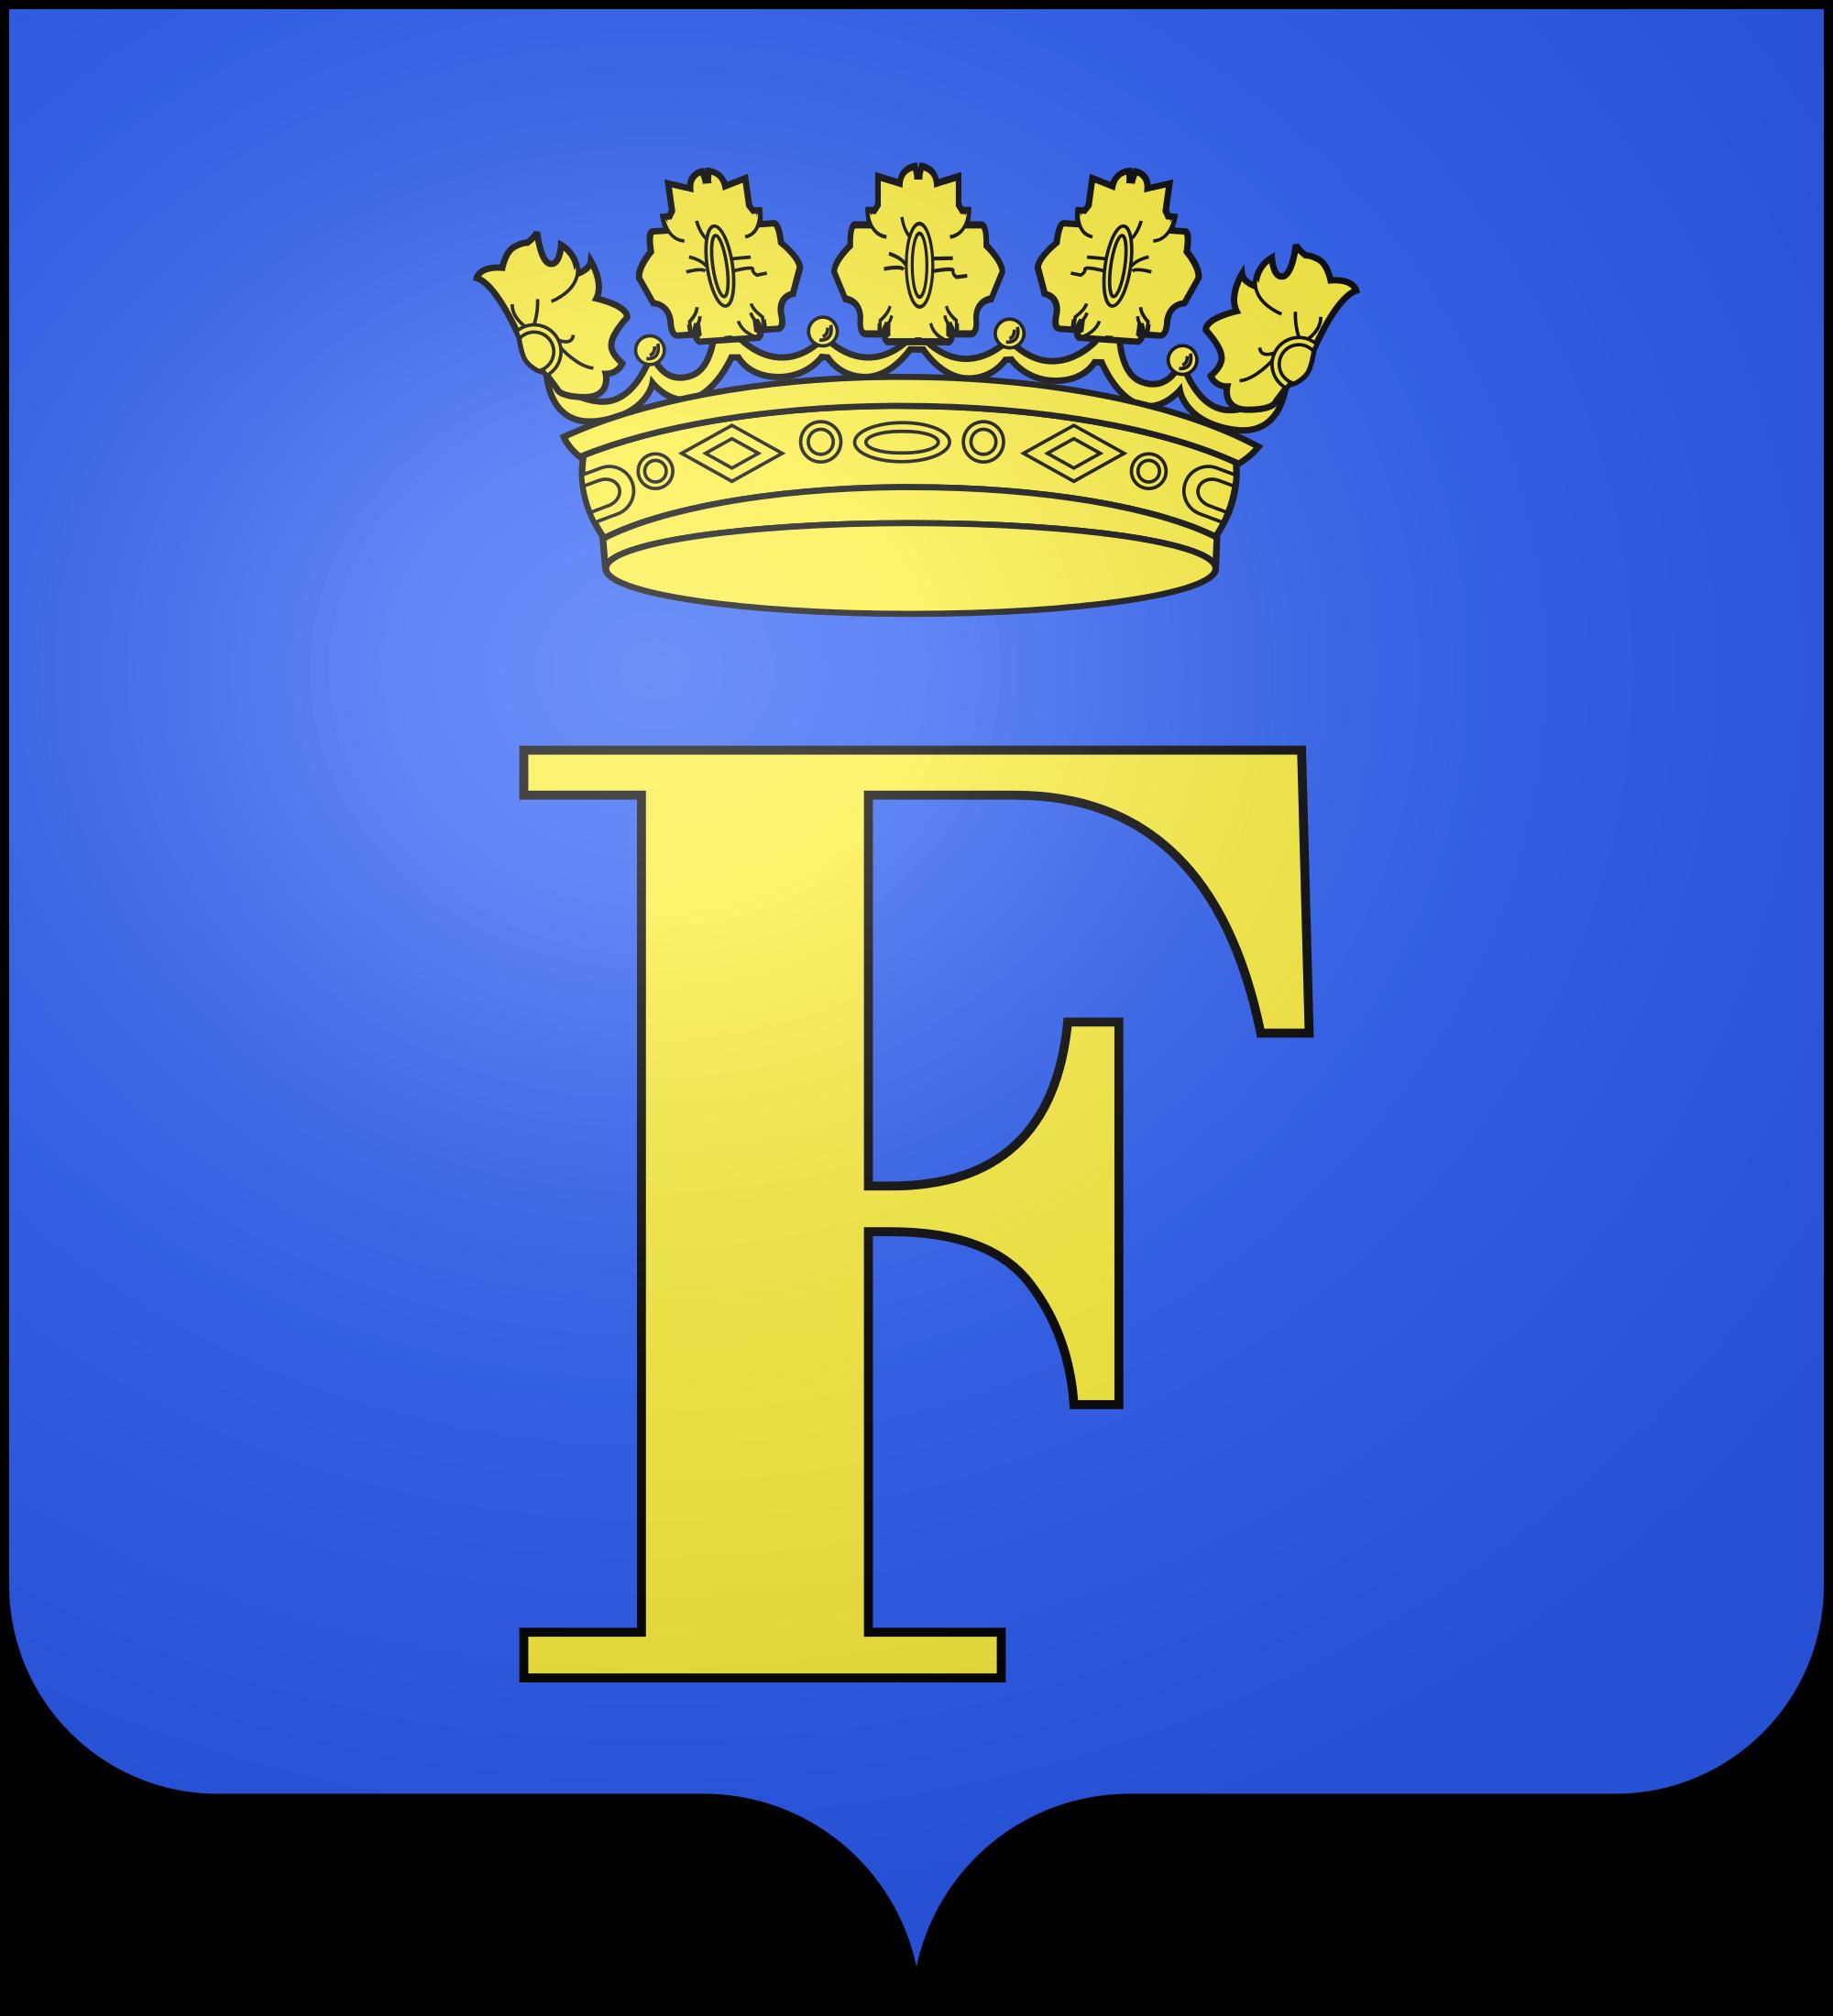 Manteau de Flavigny-sur-Ozerain